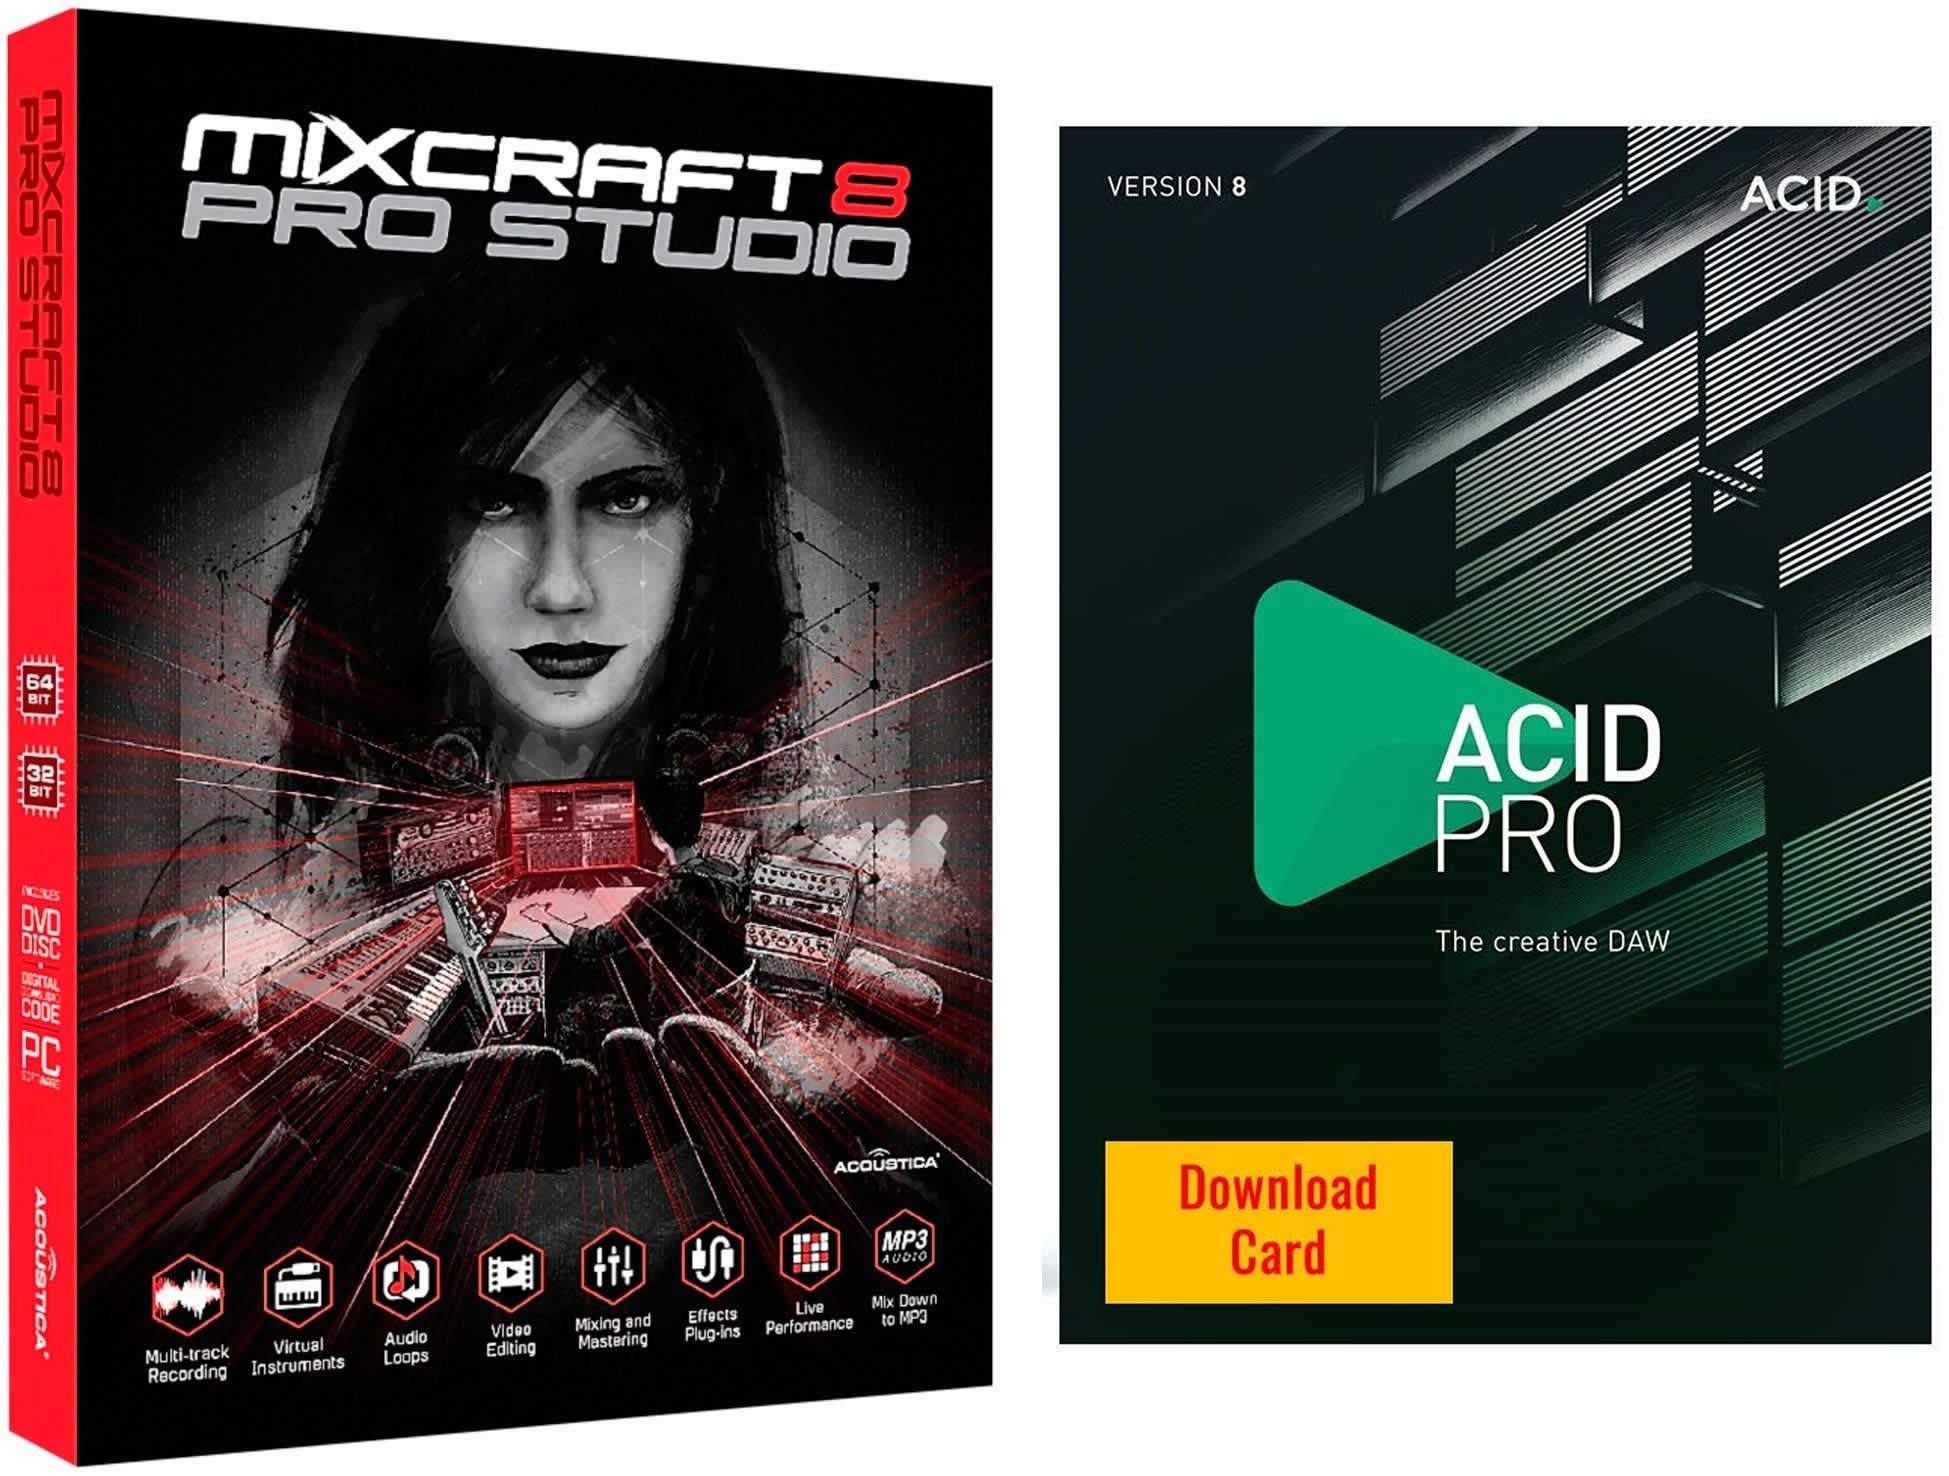 Acoustica Mixcraft 8 Pro Studio for Windows & Magix Acid Pro 8 for Windows Bundle by Acoustica